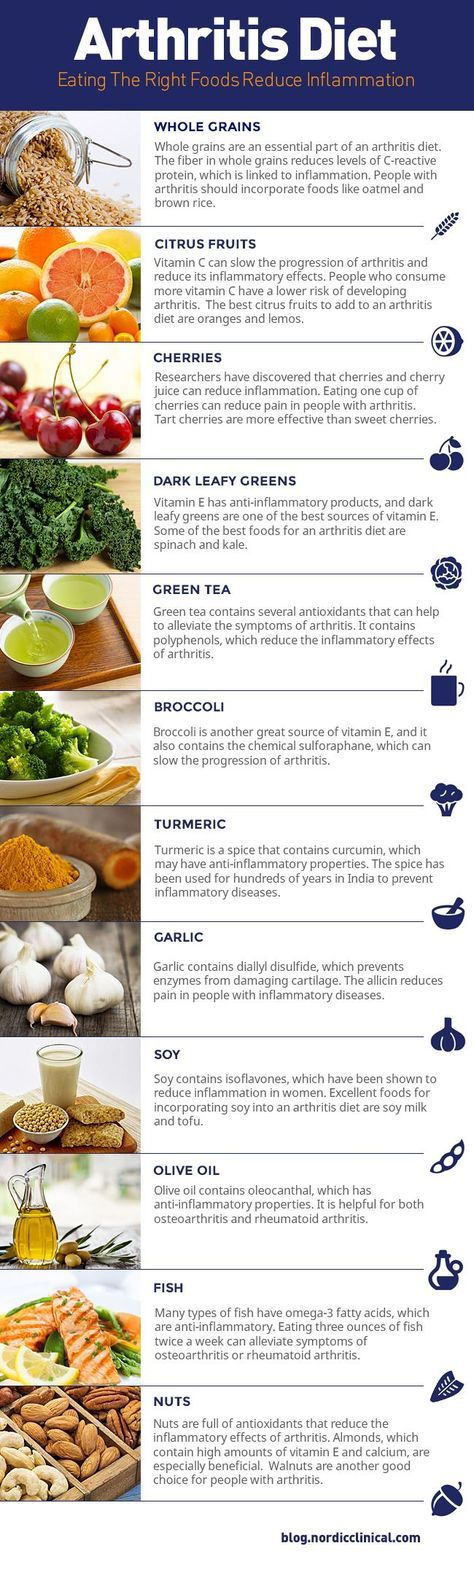 Arthritis coping diet